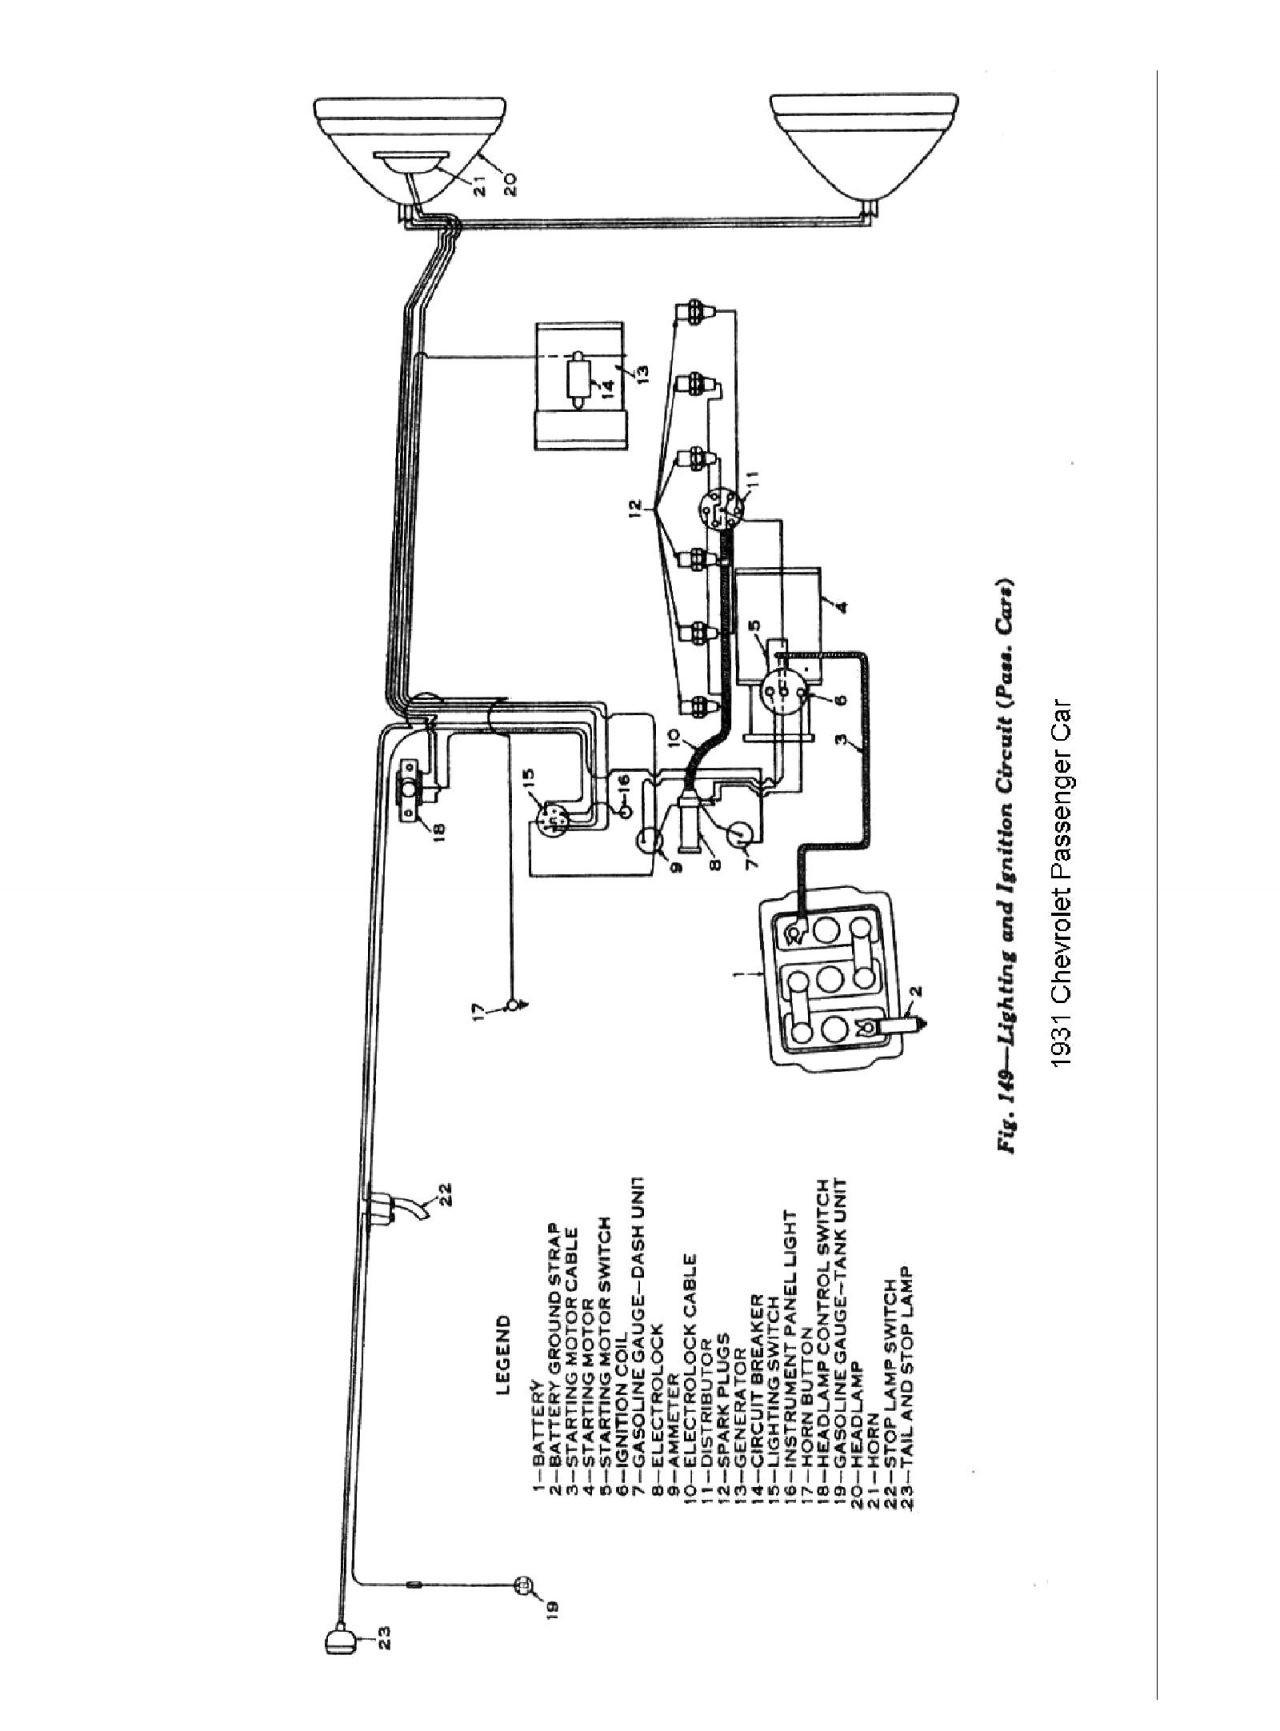 hight resolution of fresh air horn wiring diagram diagram